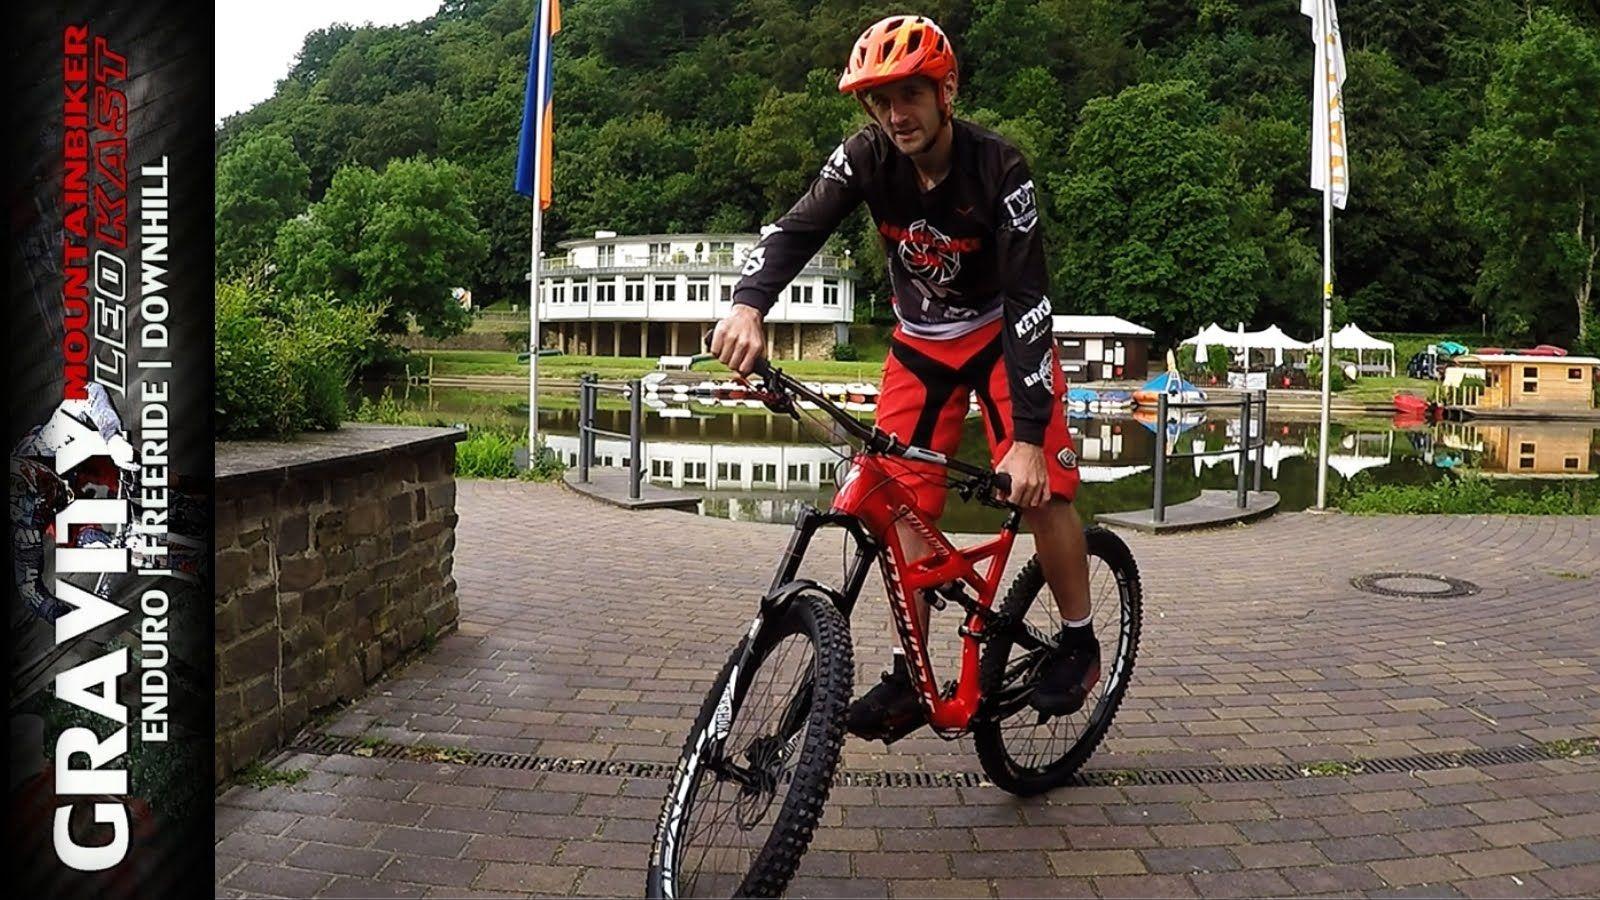 Bmlk 11 Mtb Trackstand Balance Training Mit Dem Mountainbike